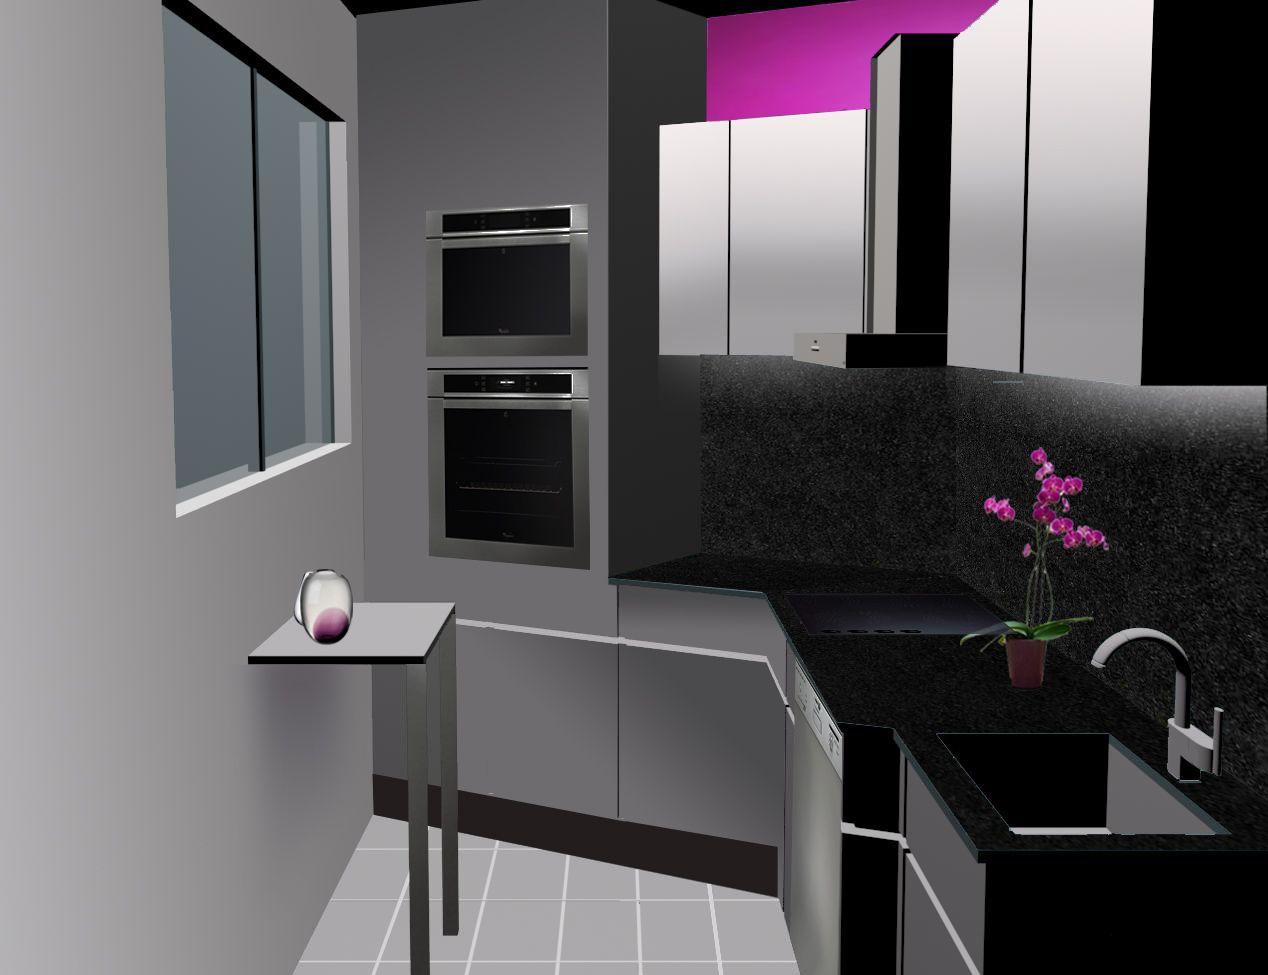 pers 1 268 975 pixels cuisine pinterest. Black Bedroom Furniture Sets. Home Design Ideas